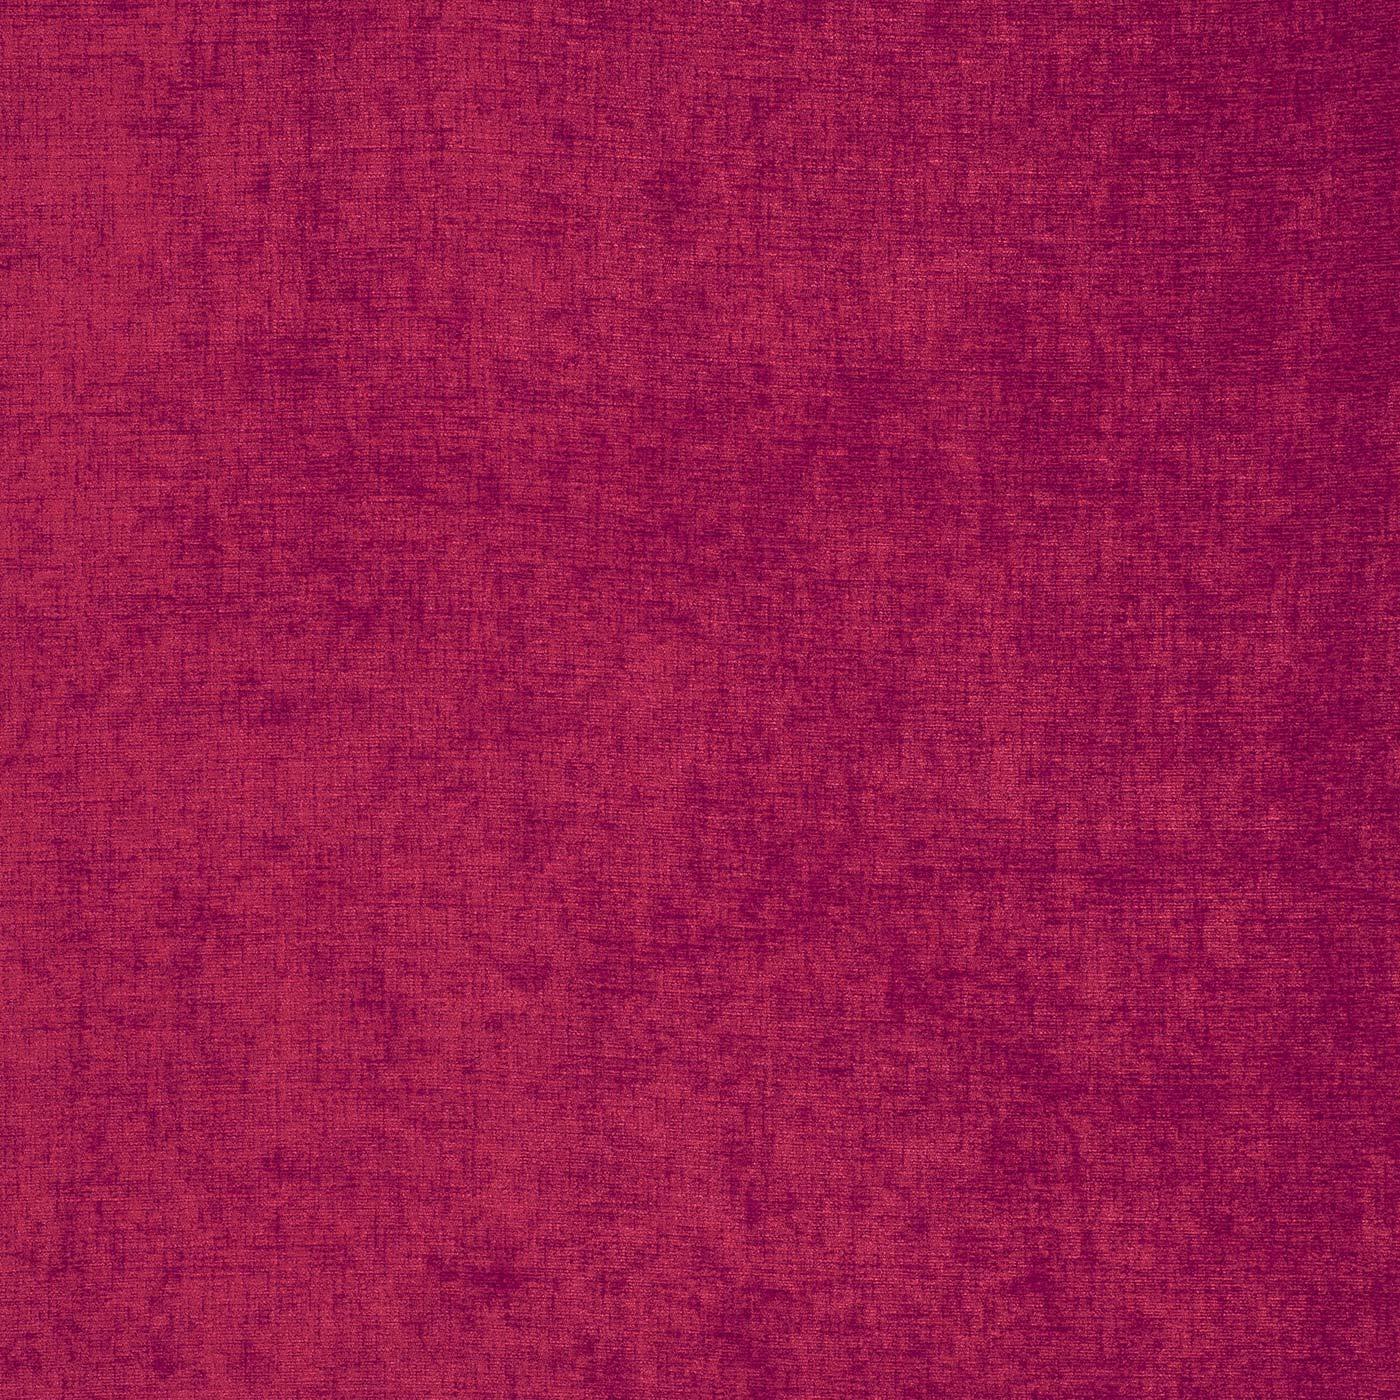 Lindon Lipstick Pink